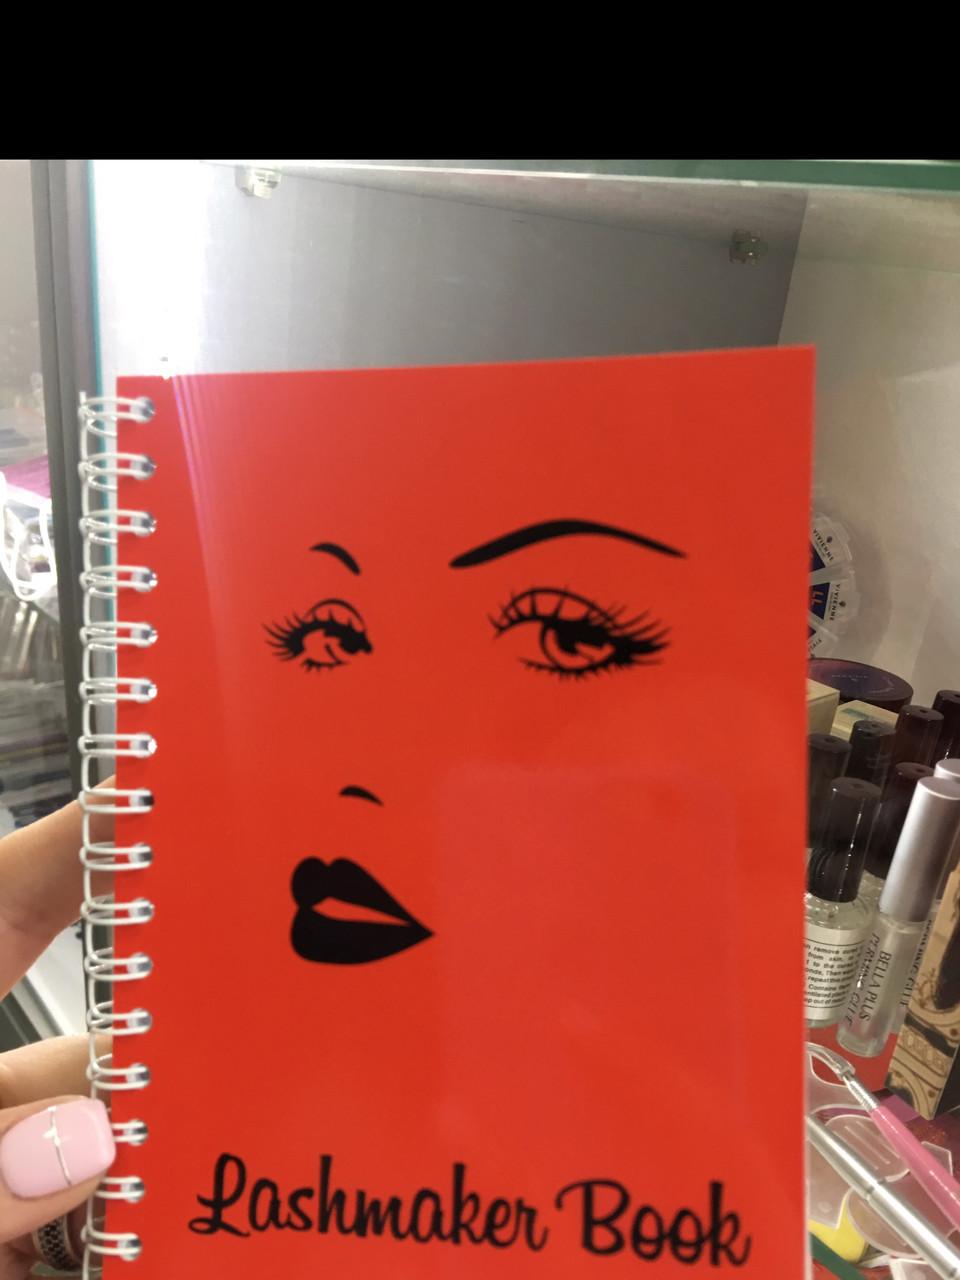 Lashmaker - book, красный